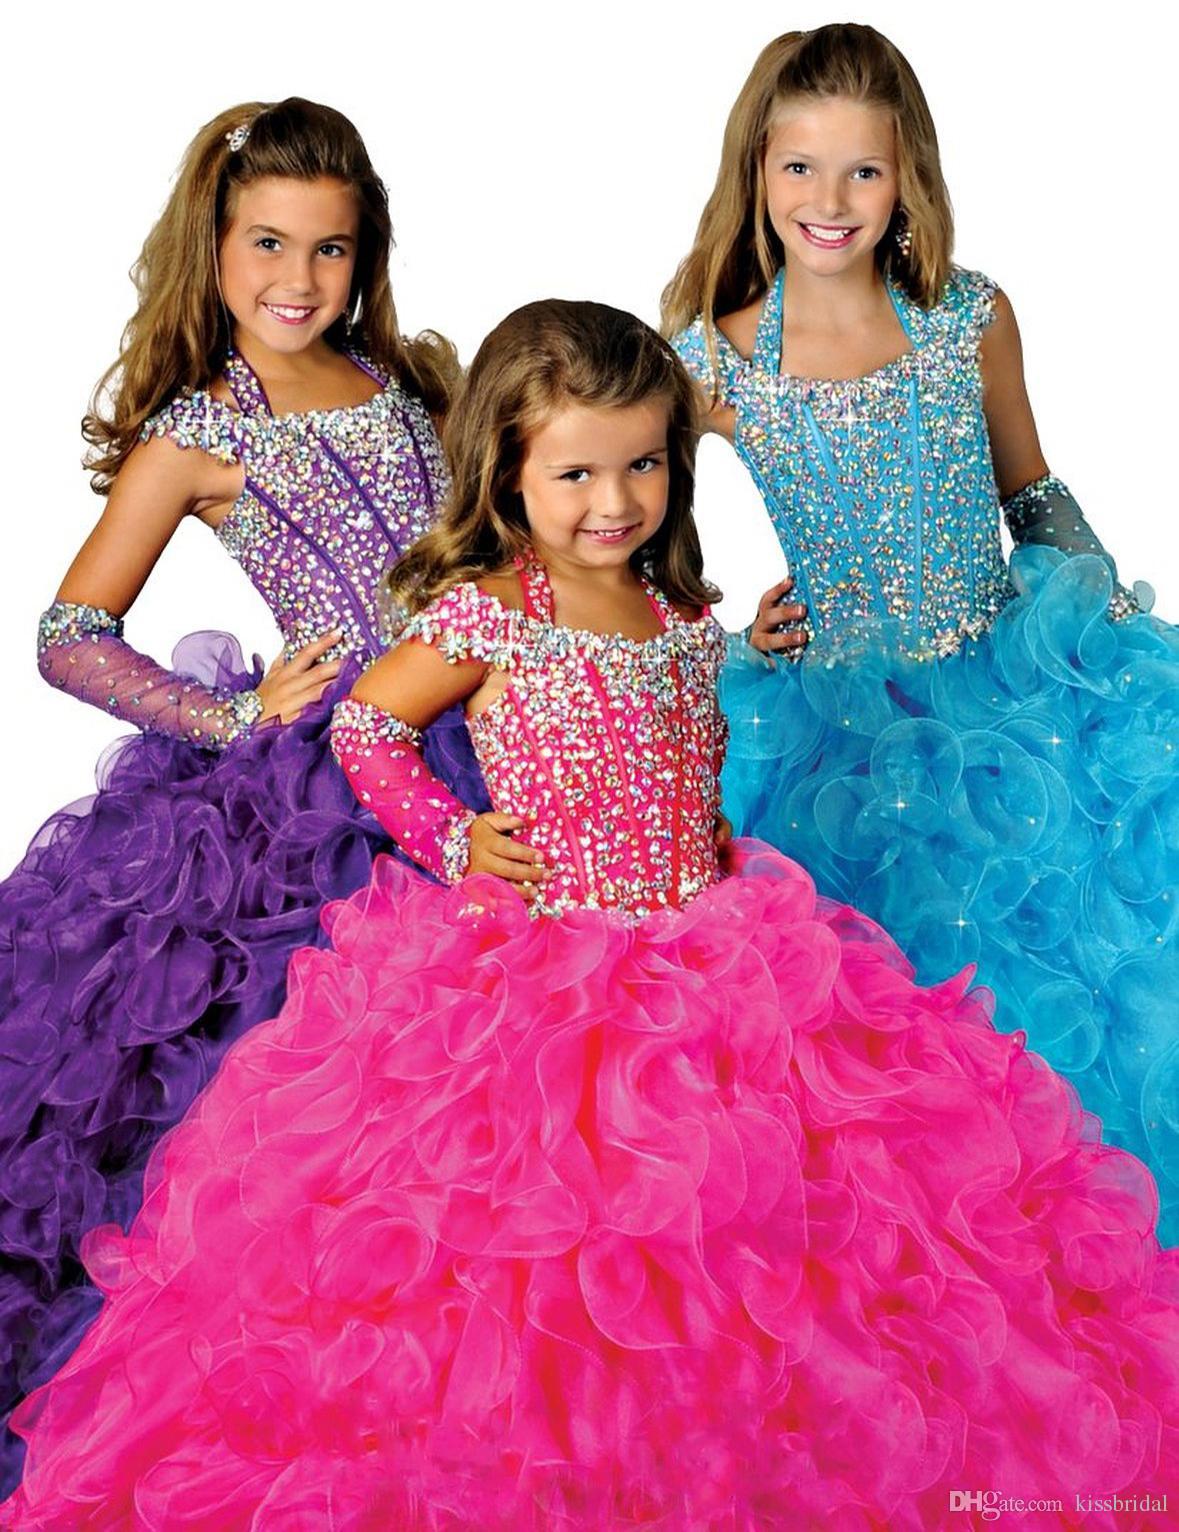 Gorgeous Purple Ball Gown Pageant Gowns for Girls Beaded Halter Neck Lace-up Back Organza Ruffles Golvlängd Blomma Flickor Klänningar